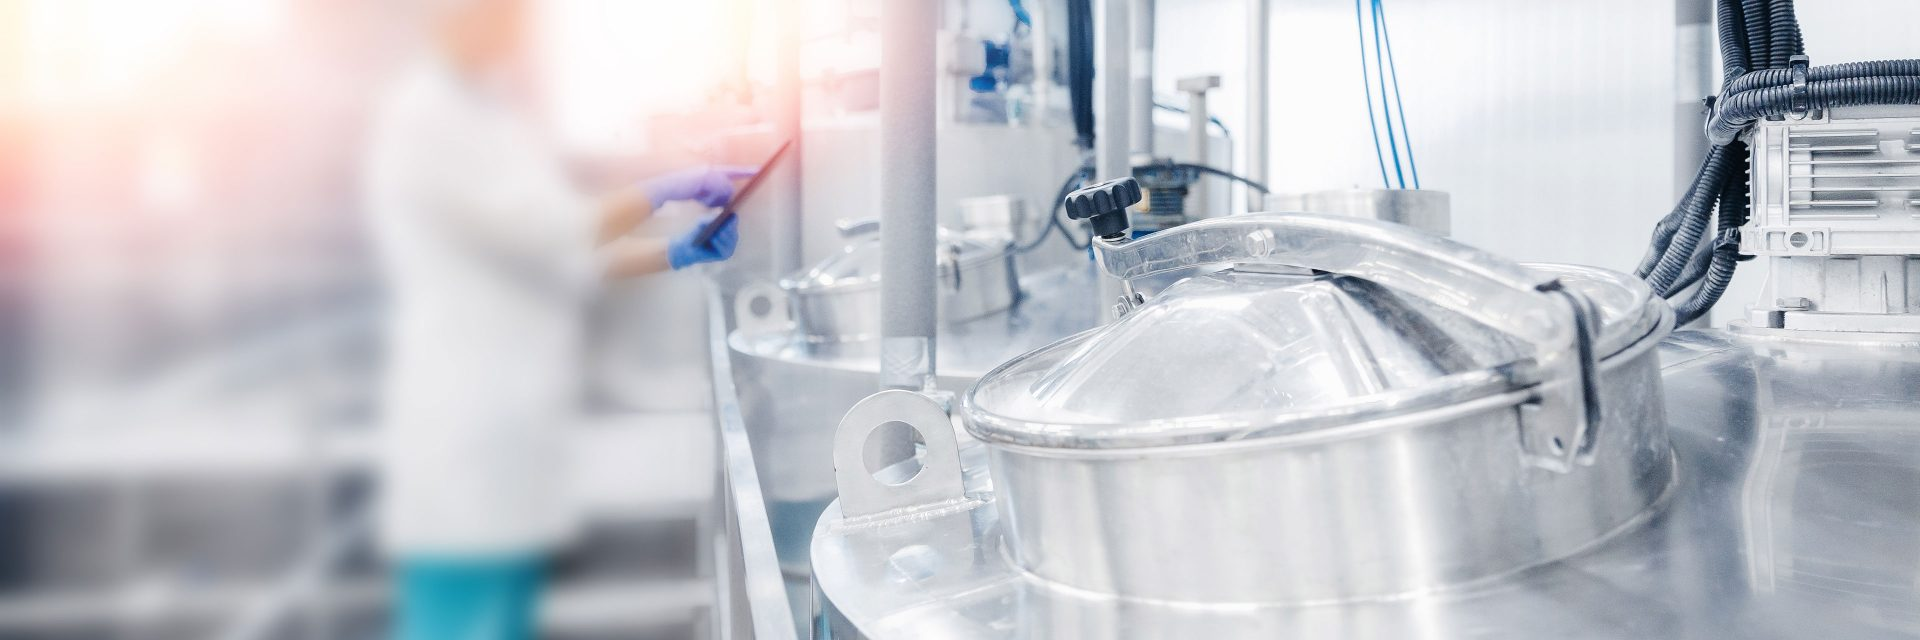 modern dairy processing tanks